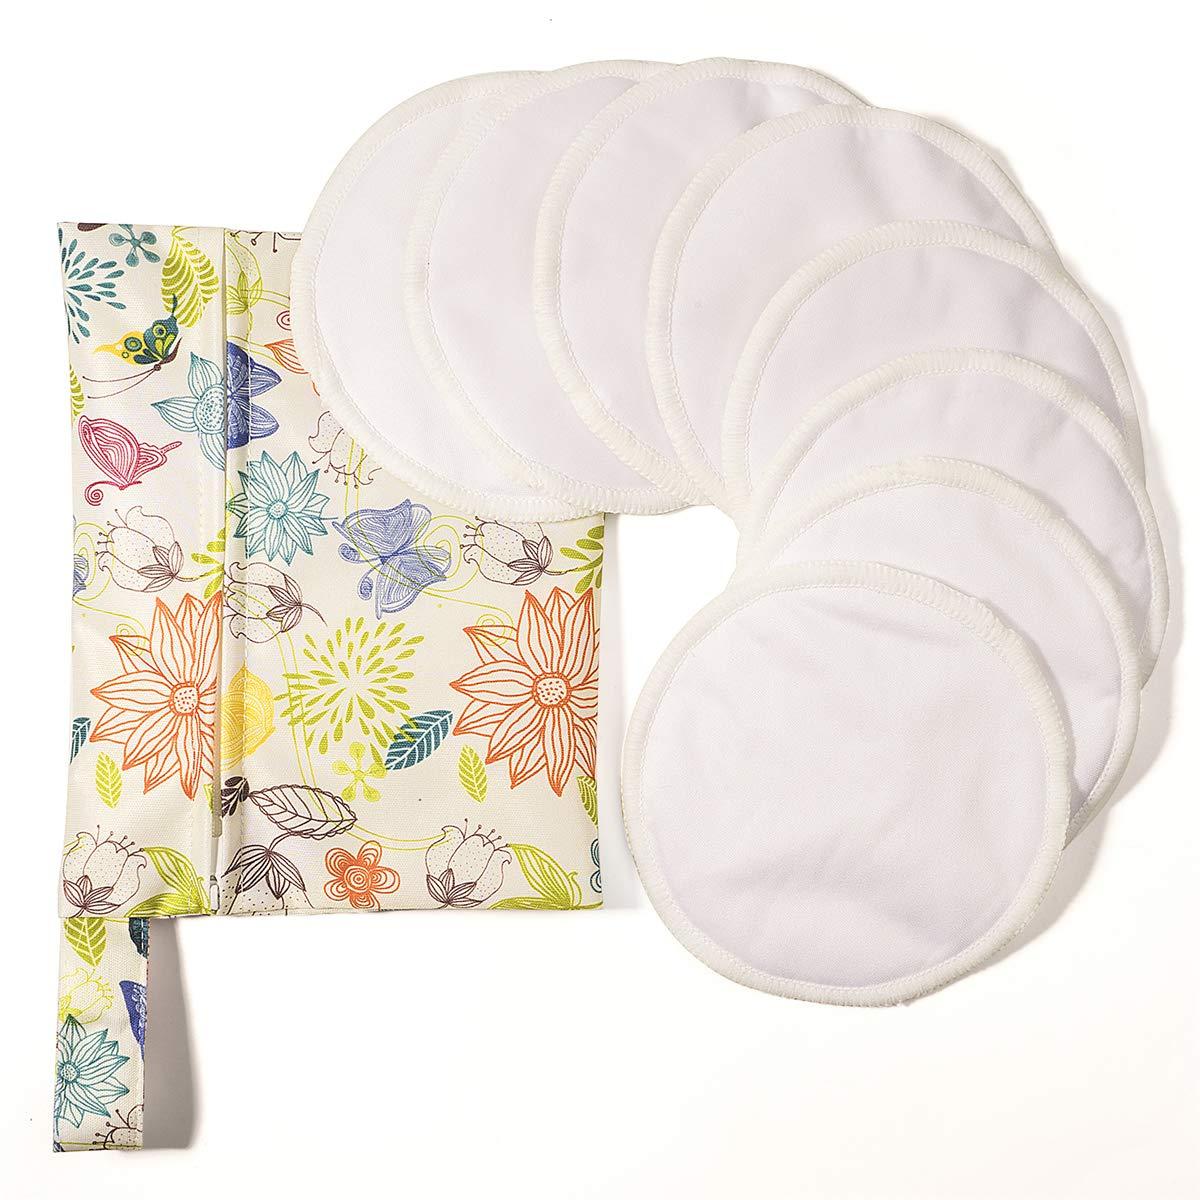 Organic Nursing Pads Washable Breast Pad Reusable Breastfeeding Pads (8 Pack) by QHiYan